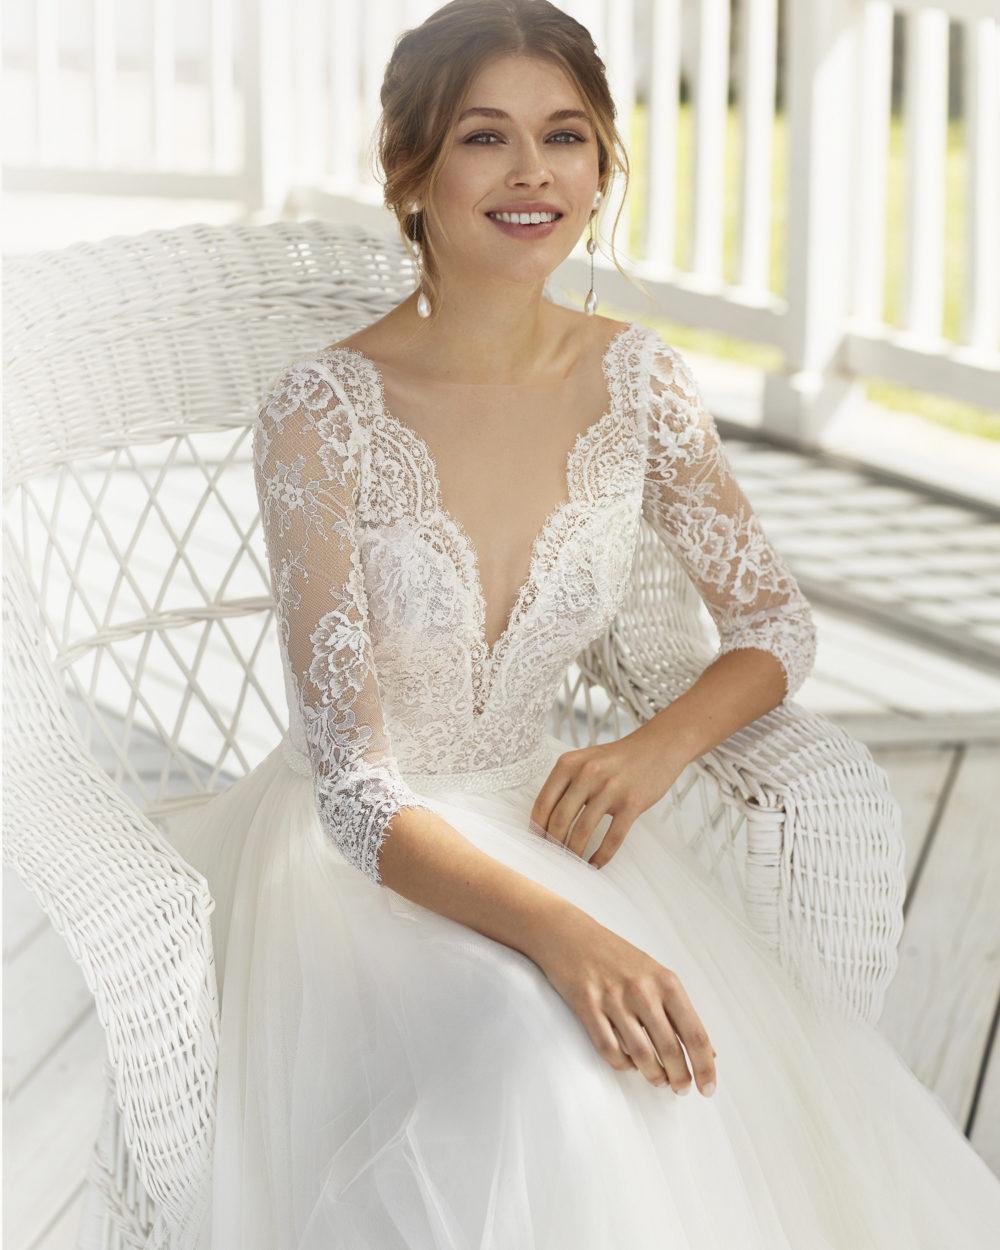 Mariages: abito da sposa Rosa Clarà 2020 a Vicenza, Verona, Padova, Veneto 4A1A5 CORFU